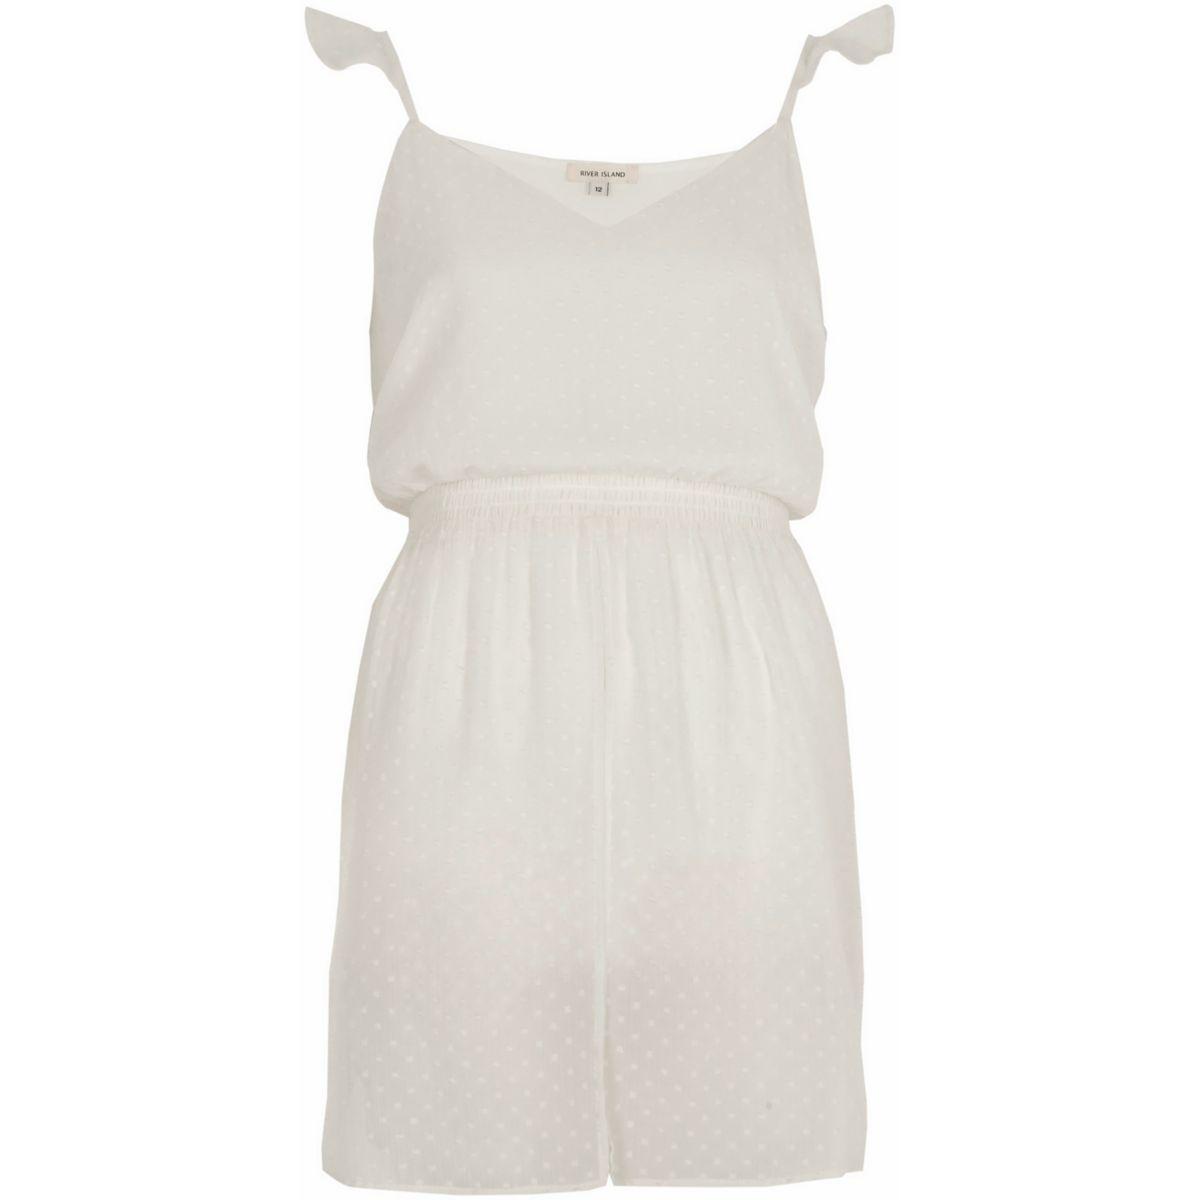 White dobby mesh longline frill cami top